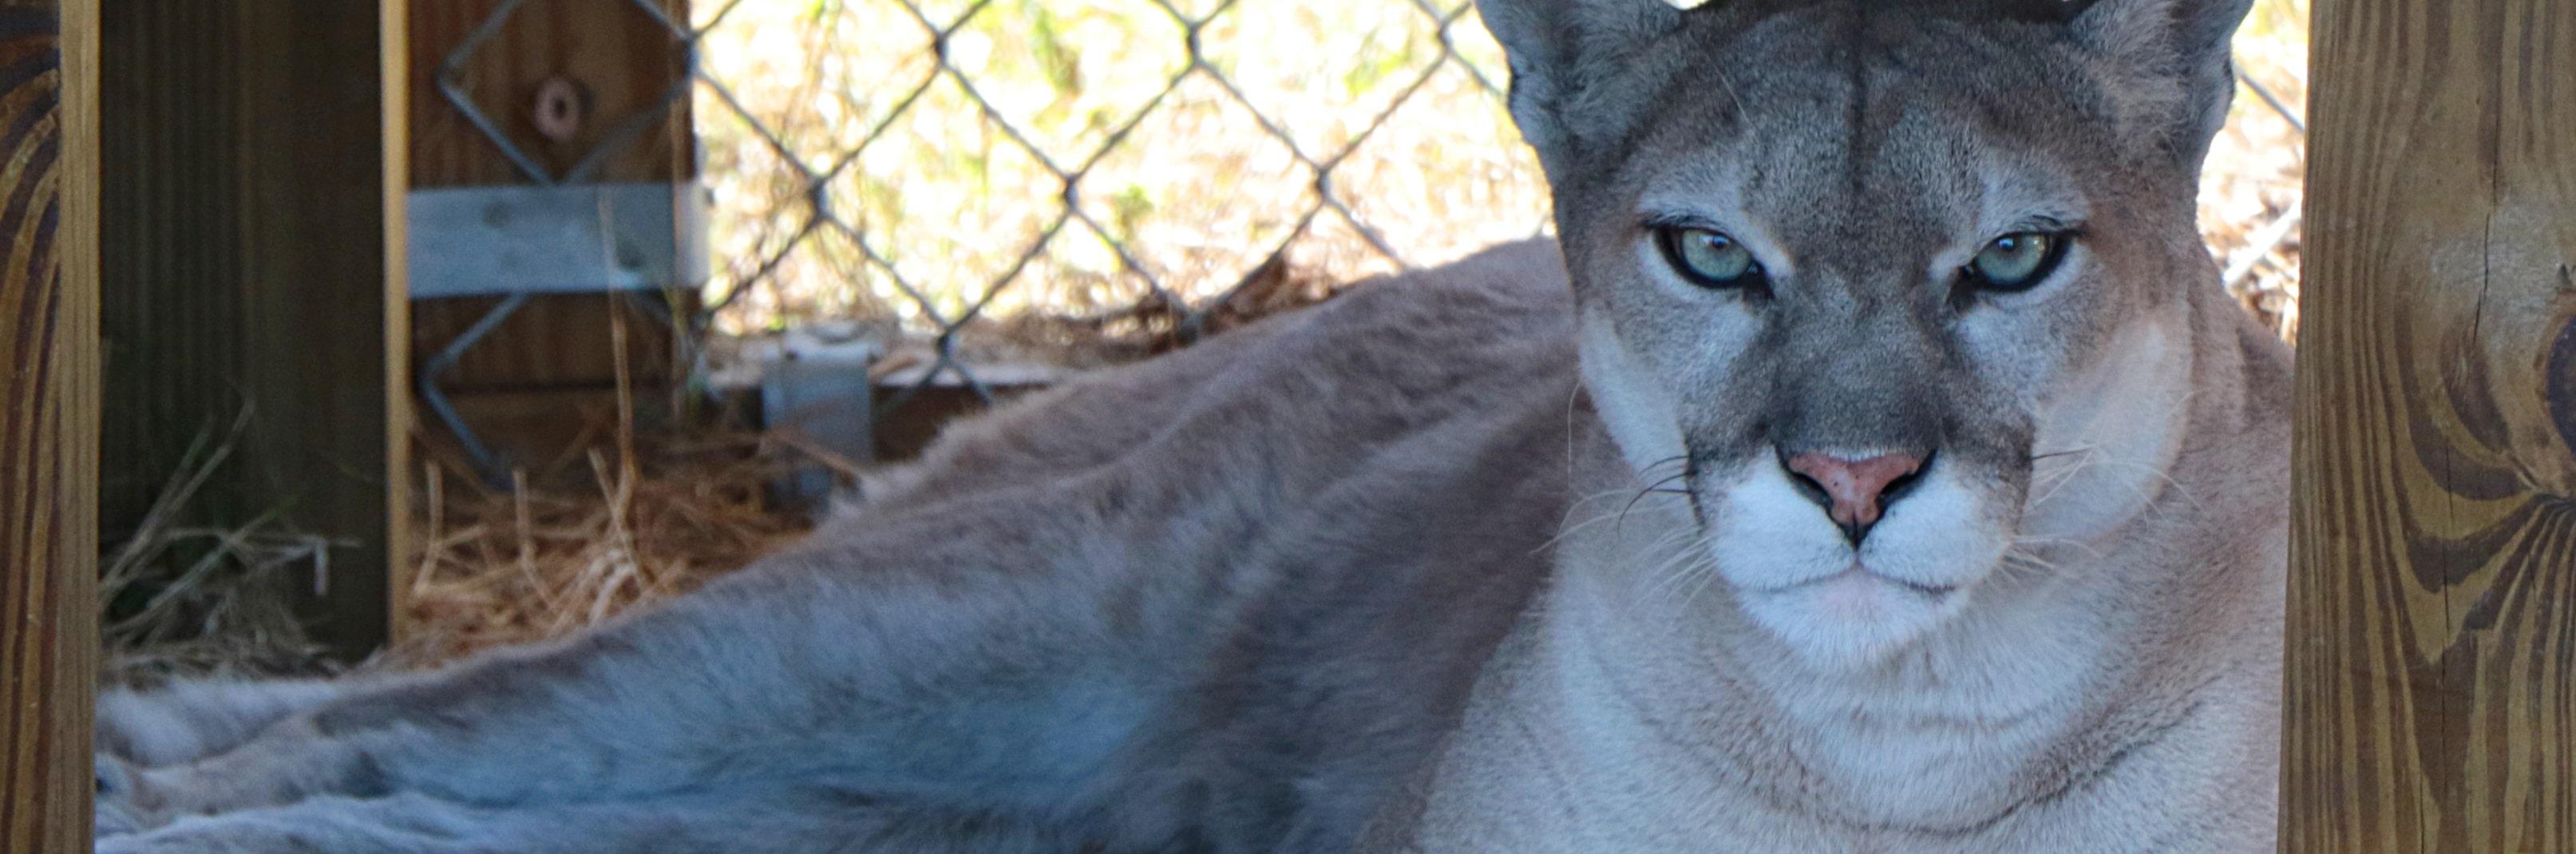 Kukla - Central Florida Animal Reserve